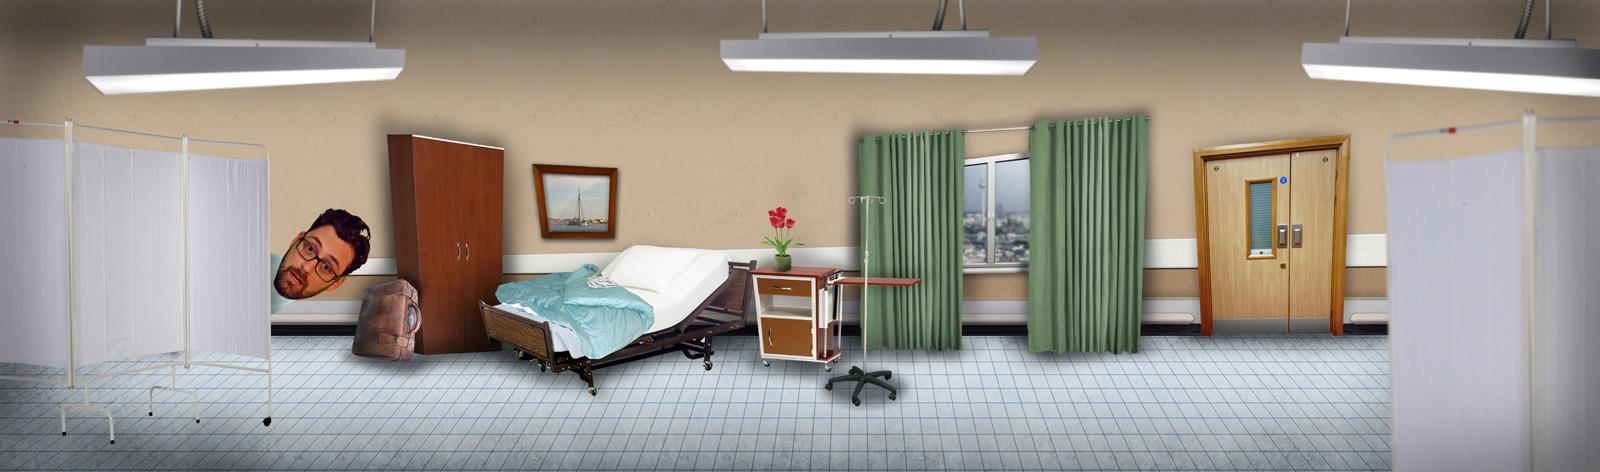 3_SDP_krankenhaus_styleframe-2.jpg